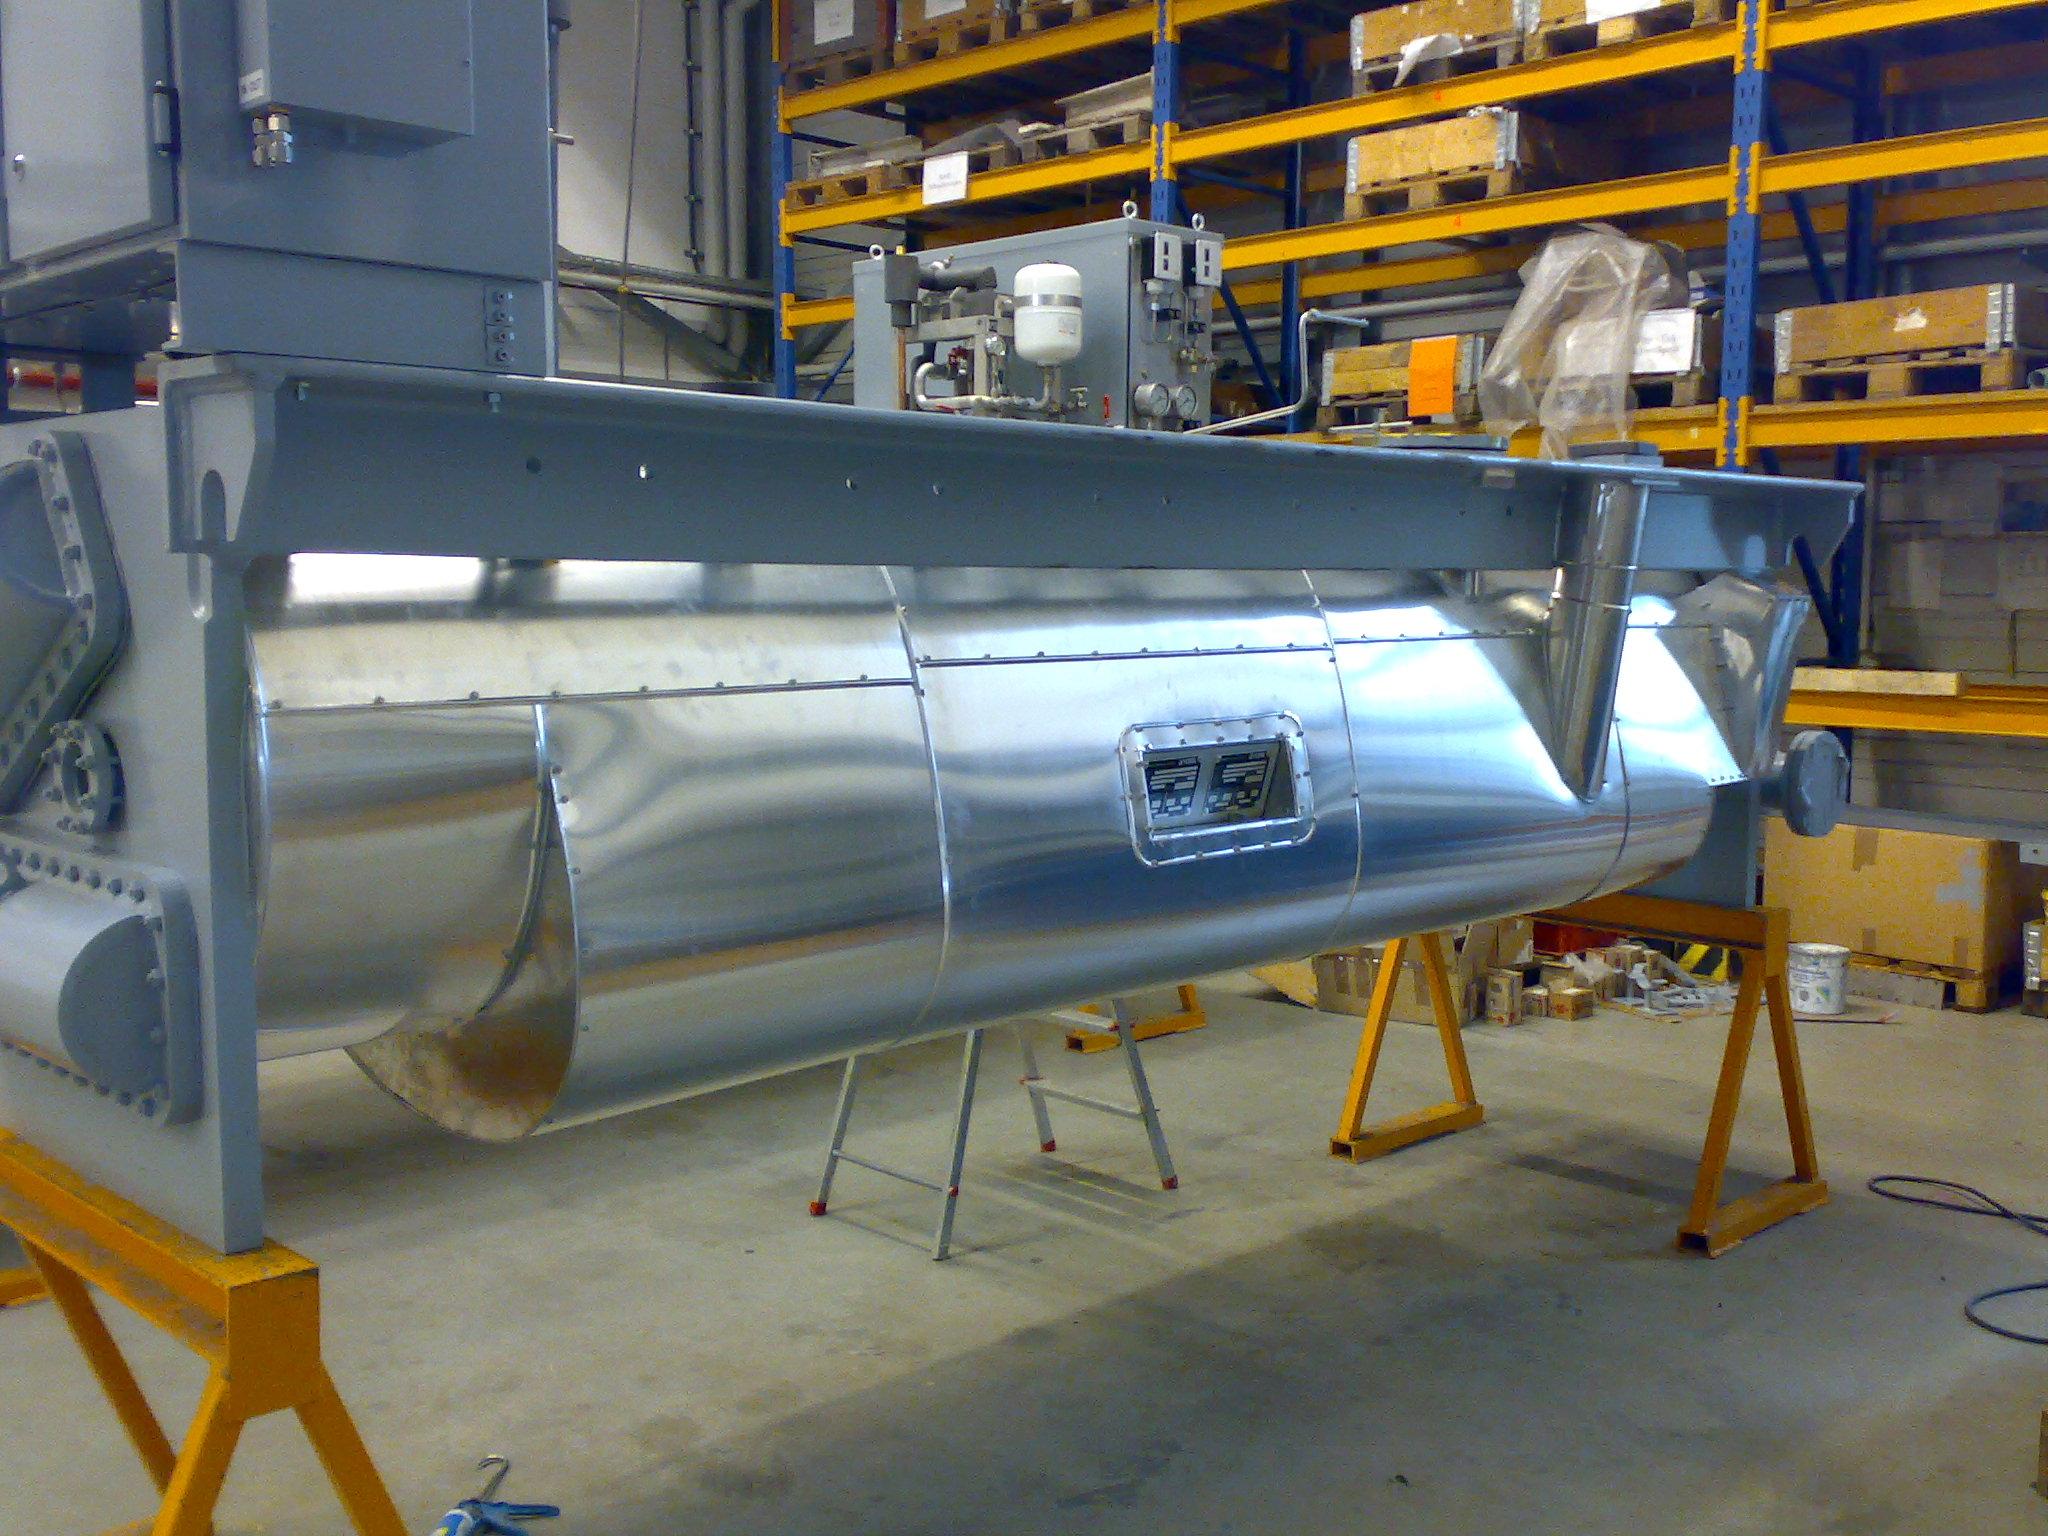 Isoprotec maritime GmbH